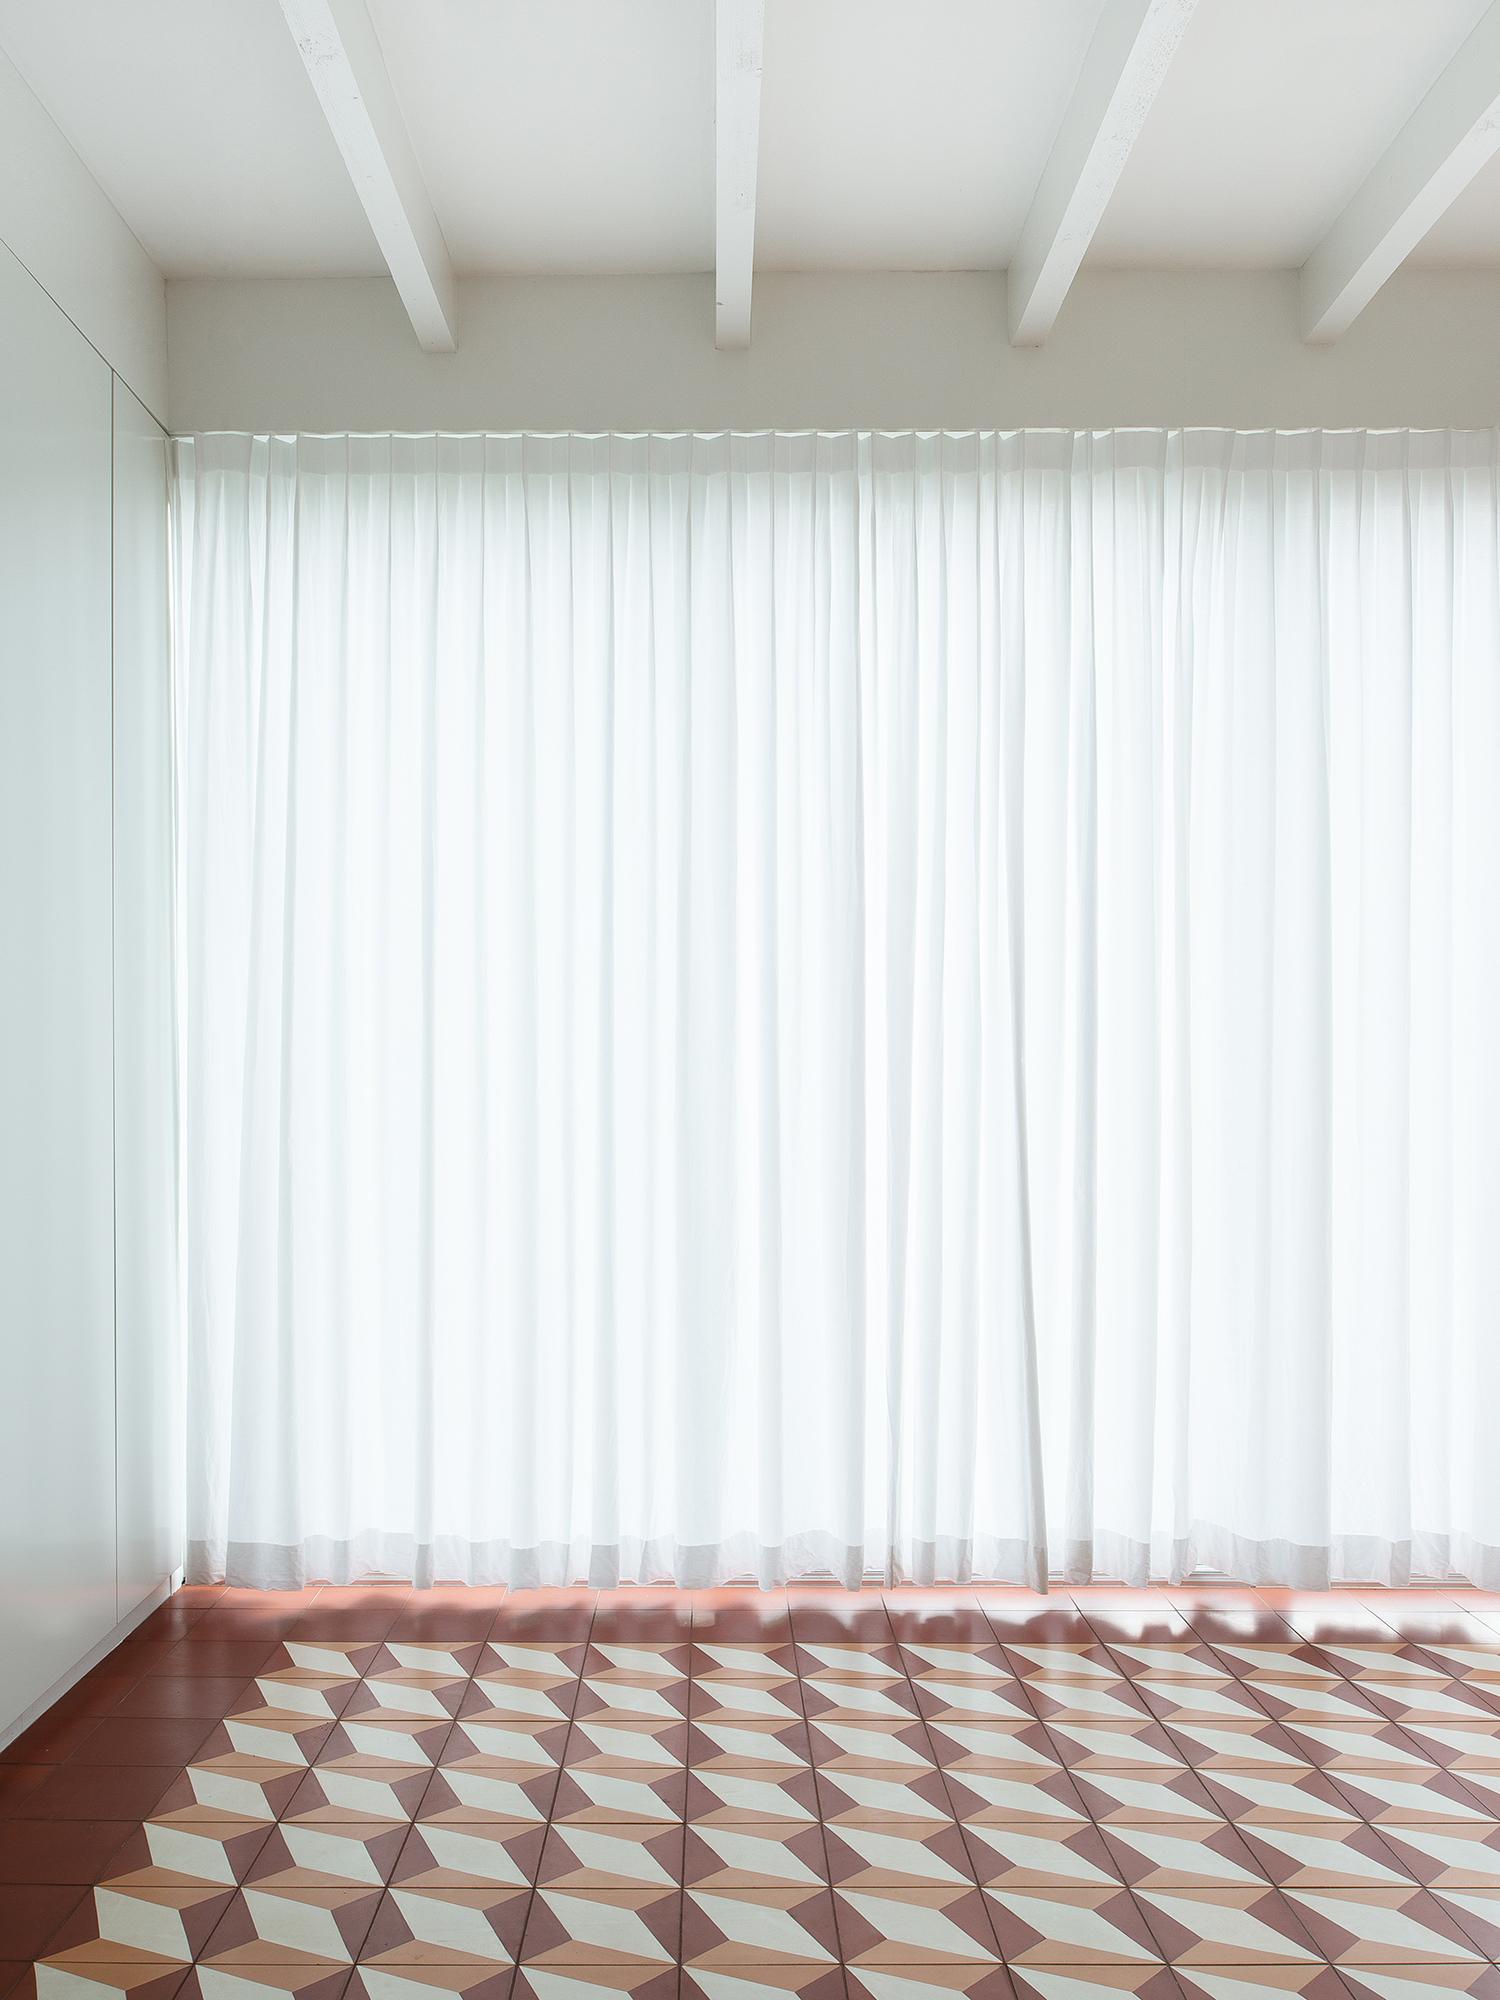 001_Image_Curtain.jpg